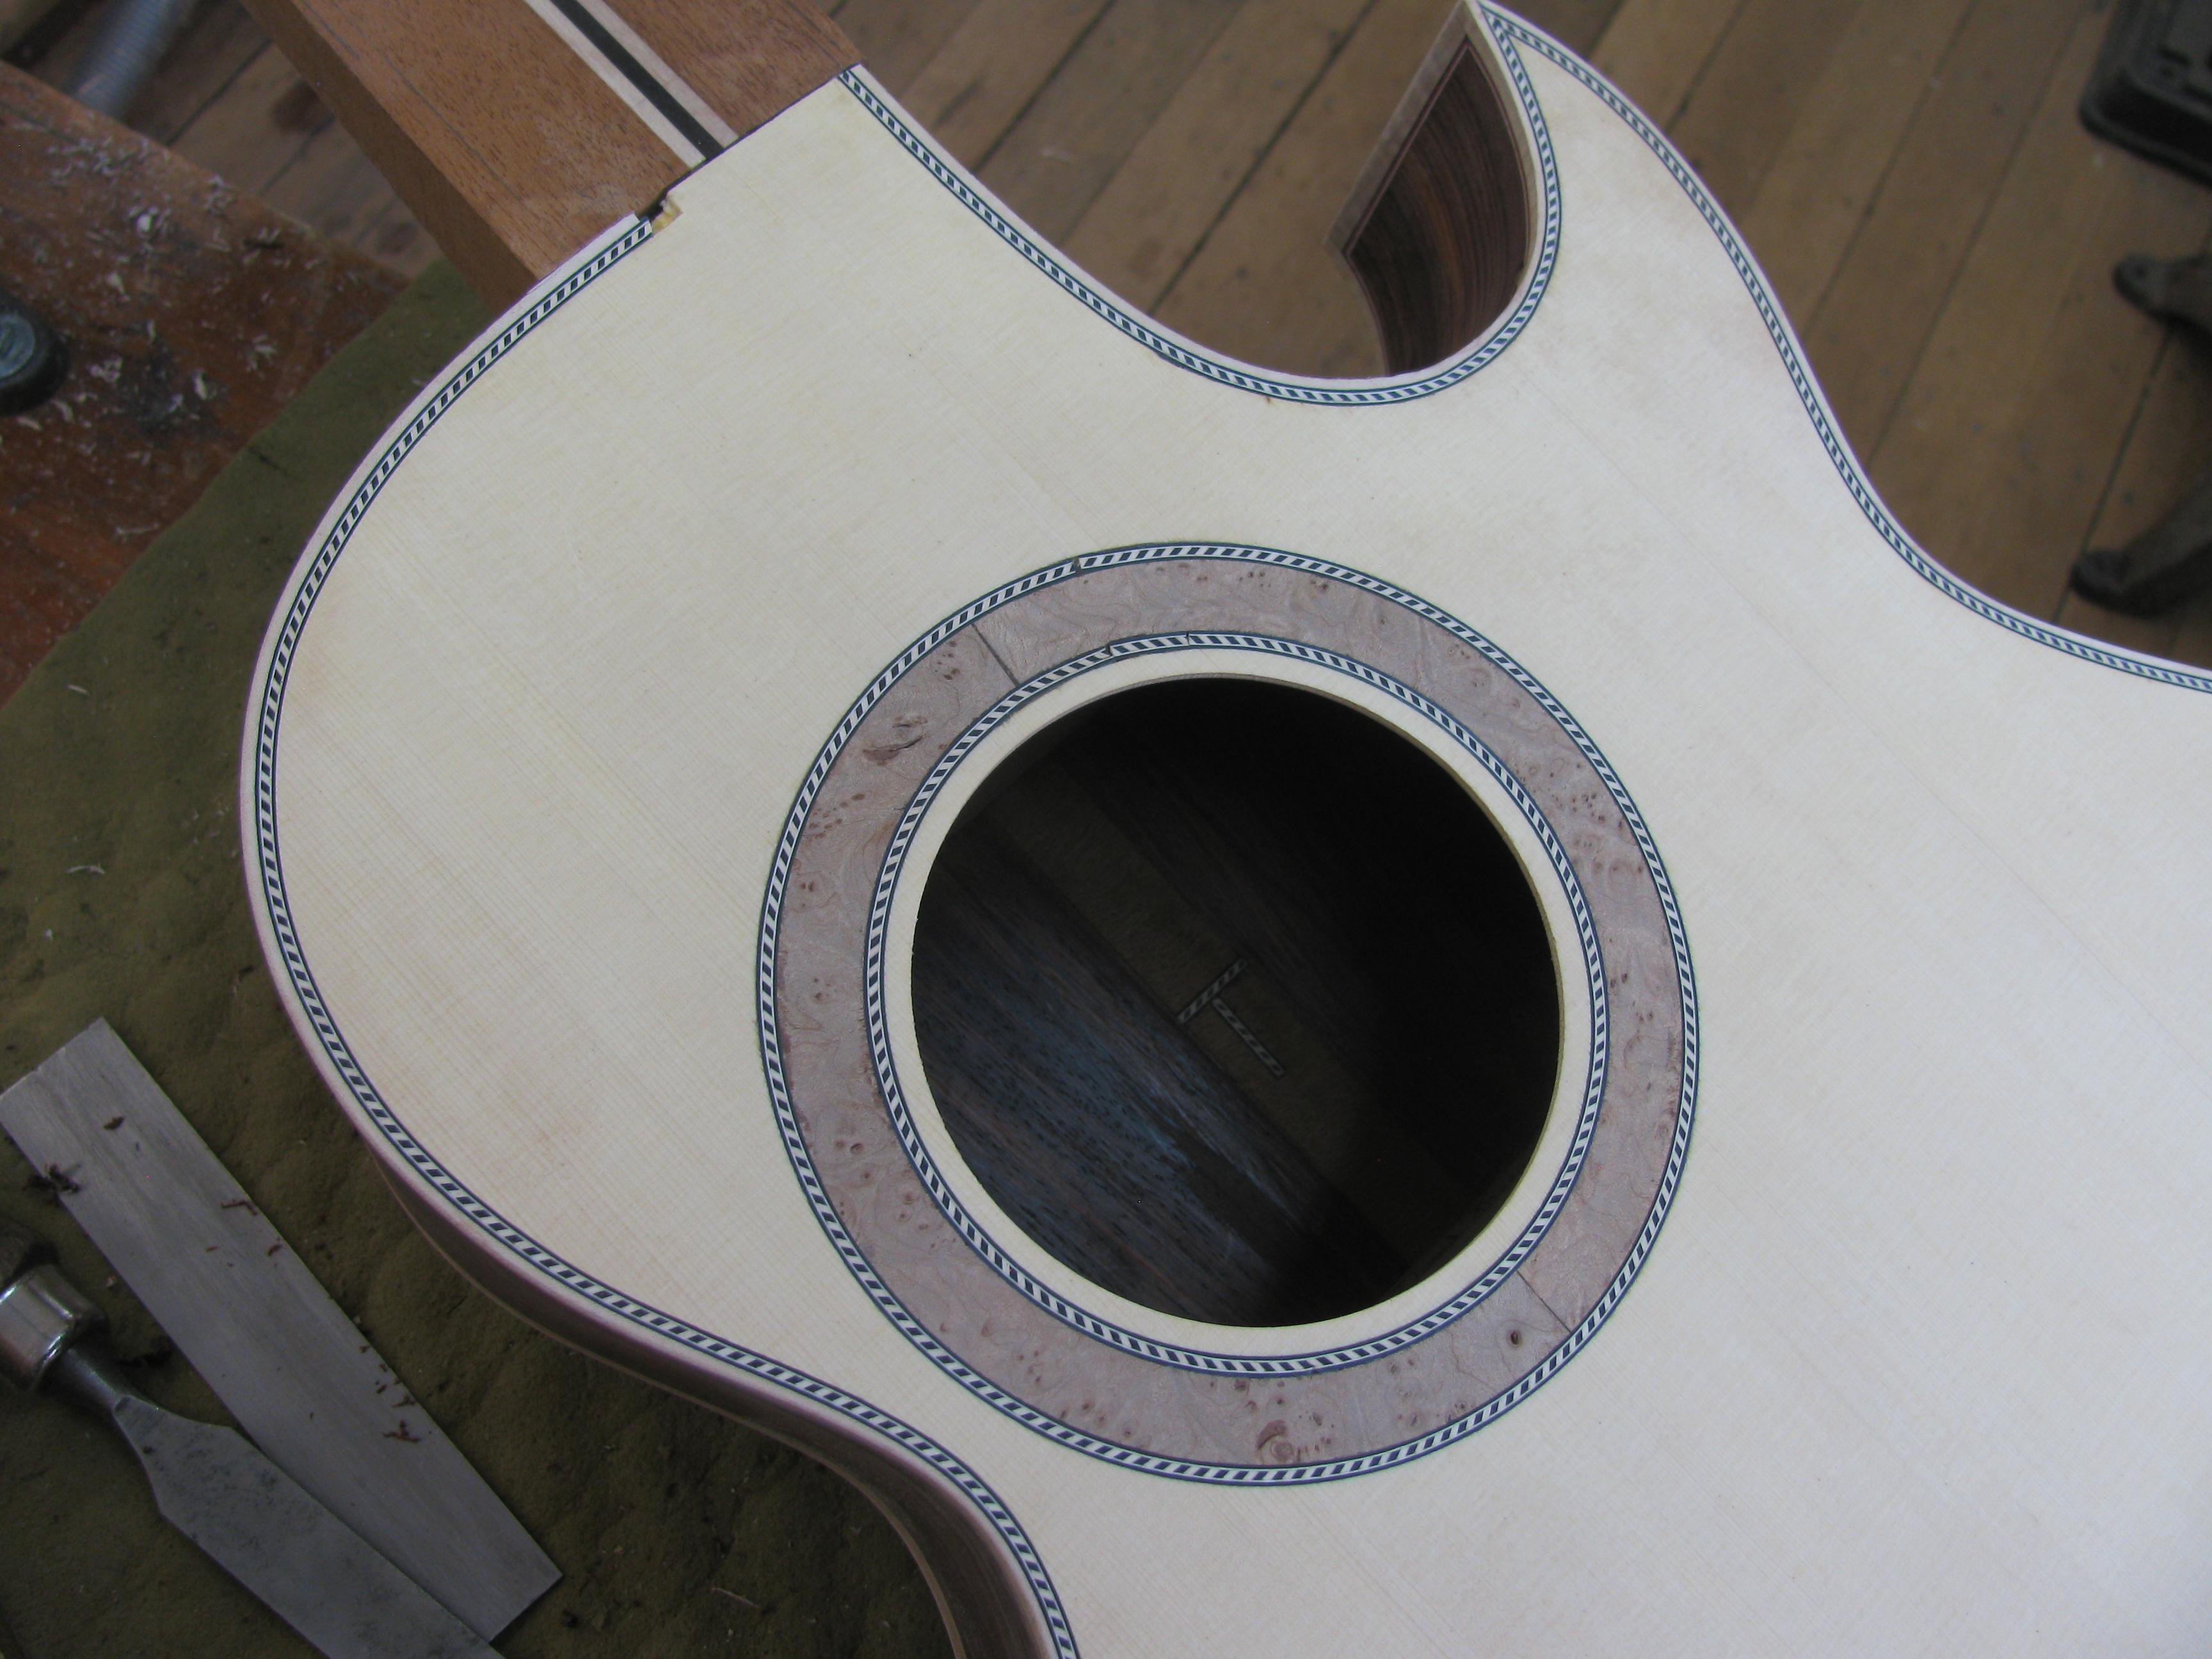 timeless instruments guitar making school lutherie supplies custom instruments david. Black Bedroom Furniture Sets. Home Design Ideas